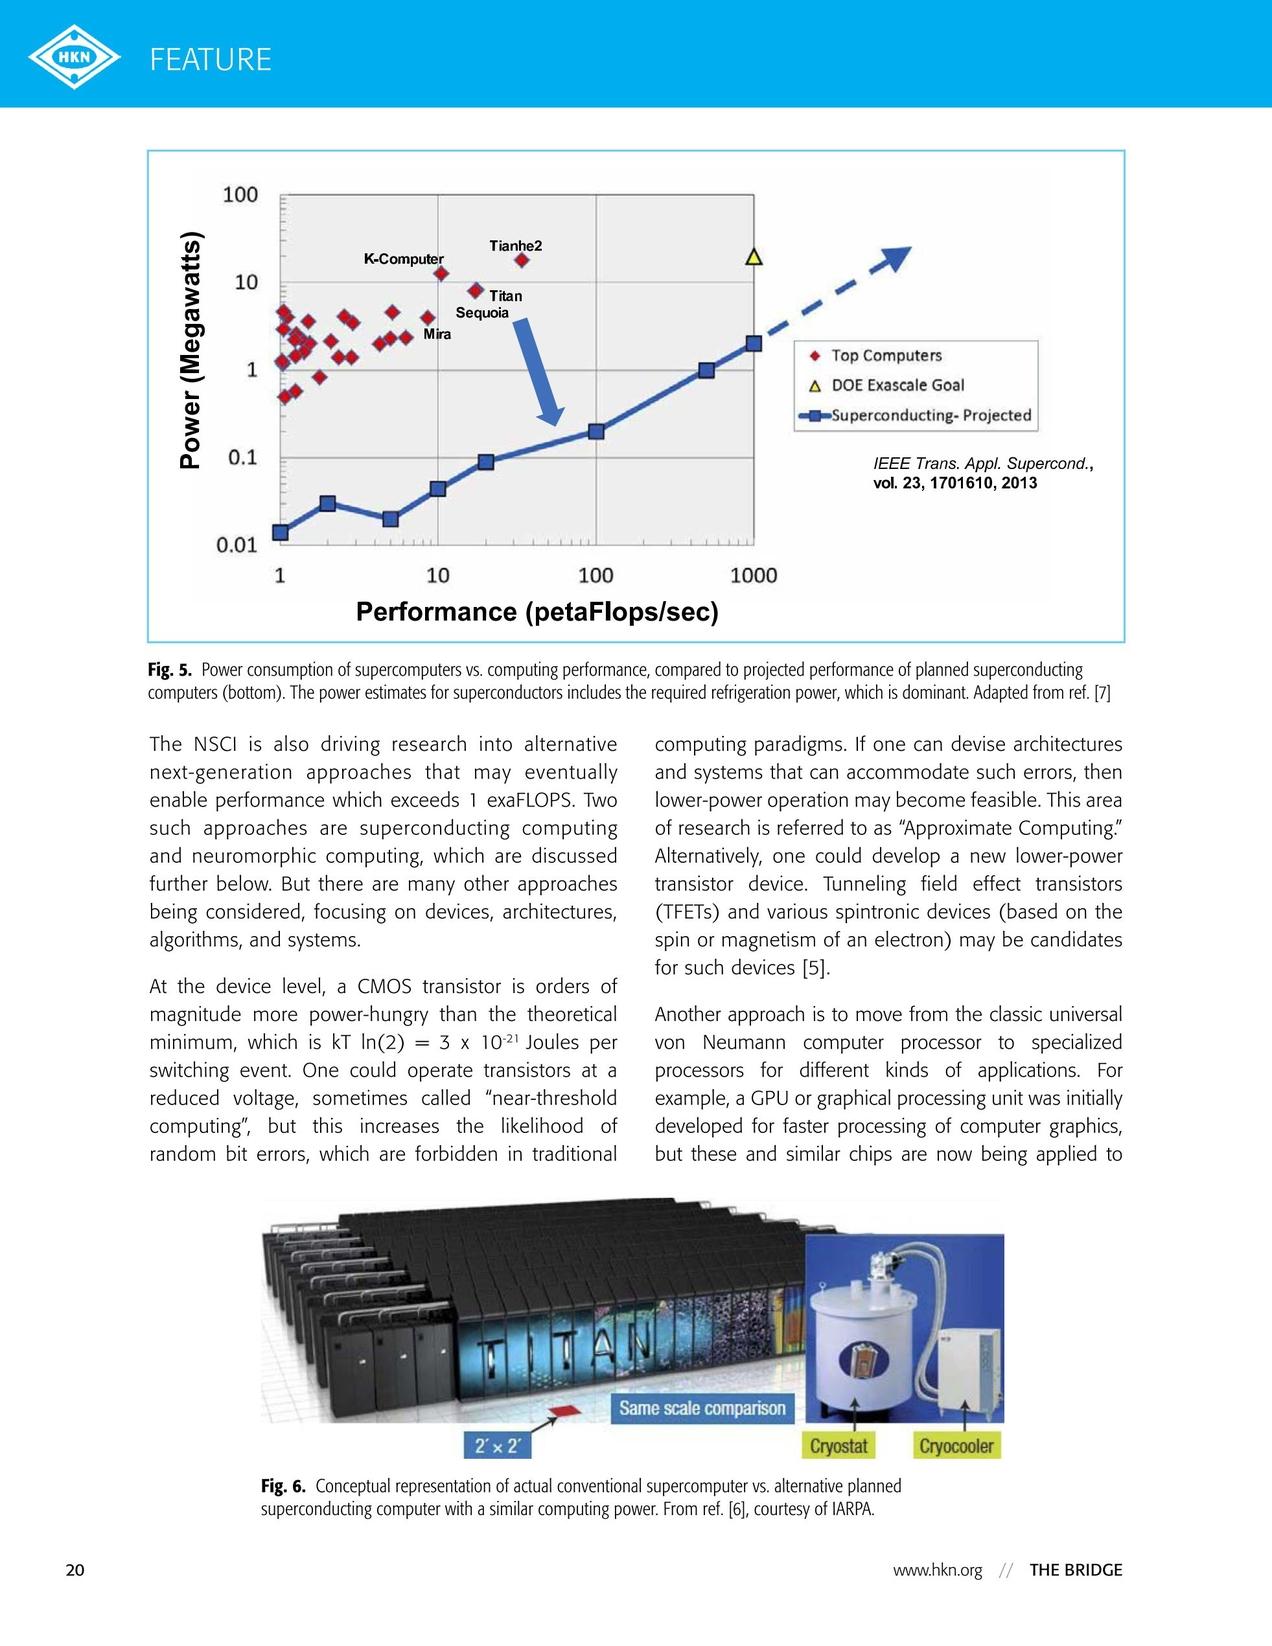 The Magazine of IEEE-Eta Kappa Nu July 2017